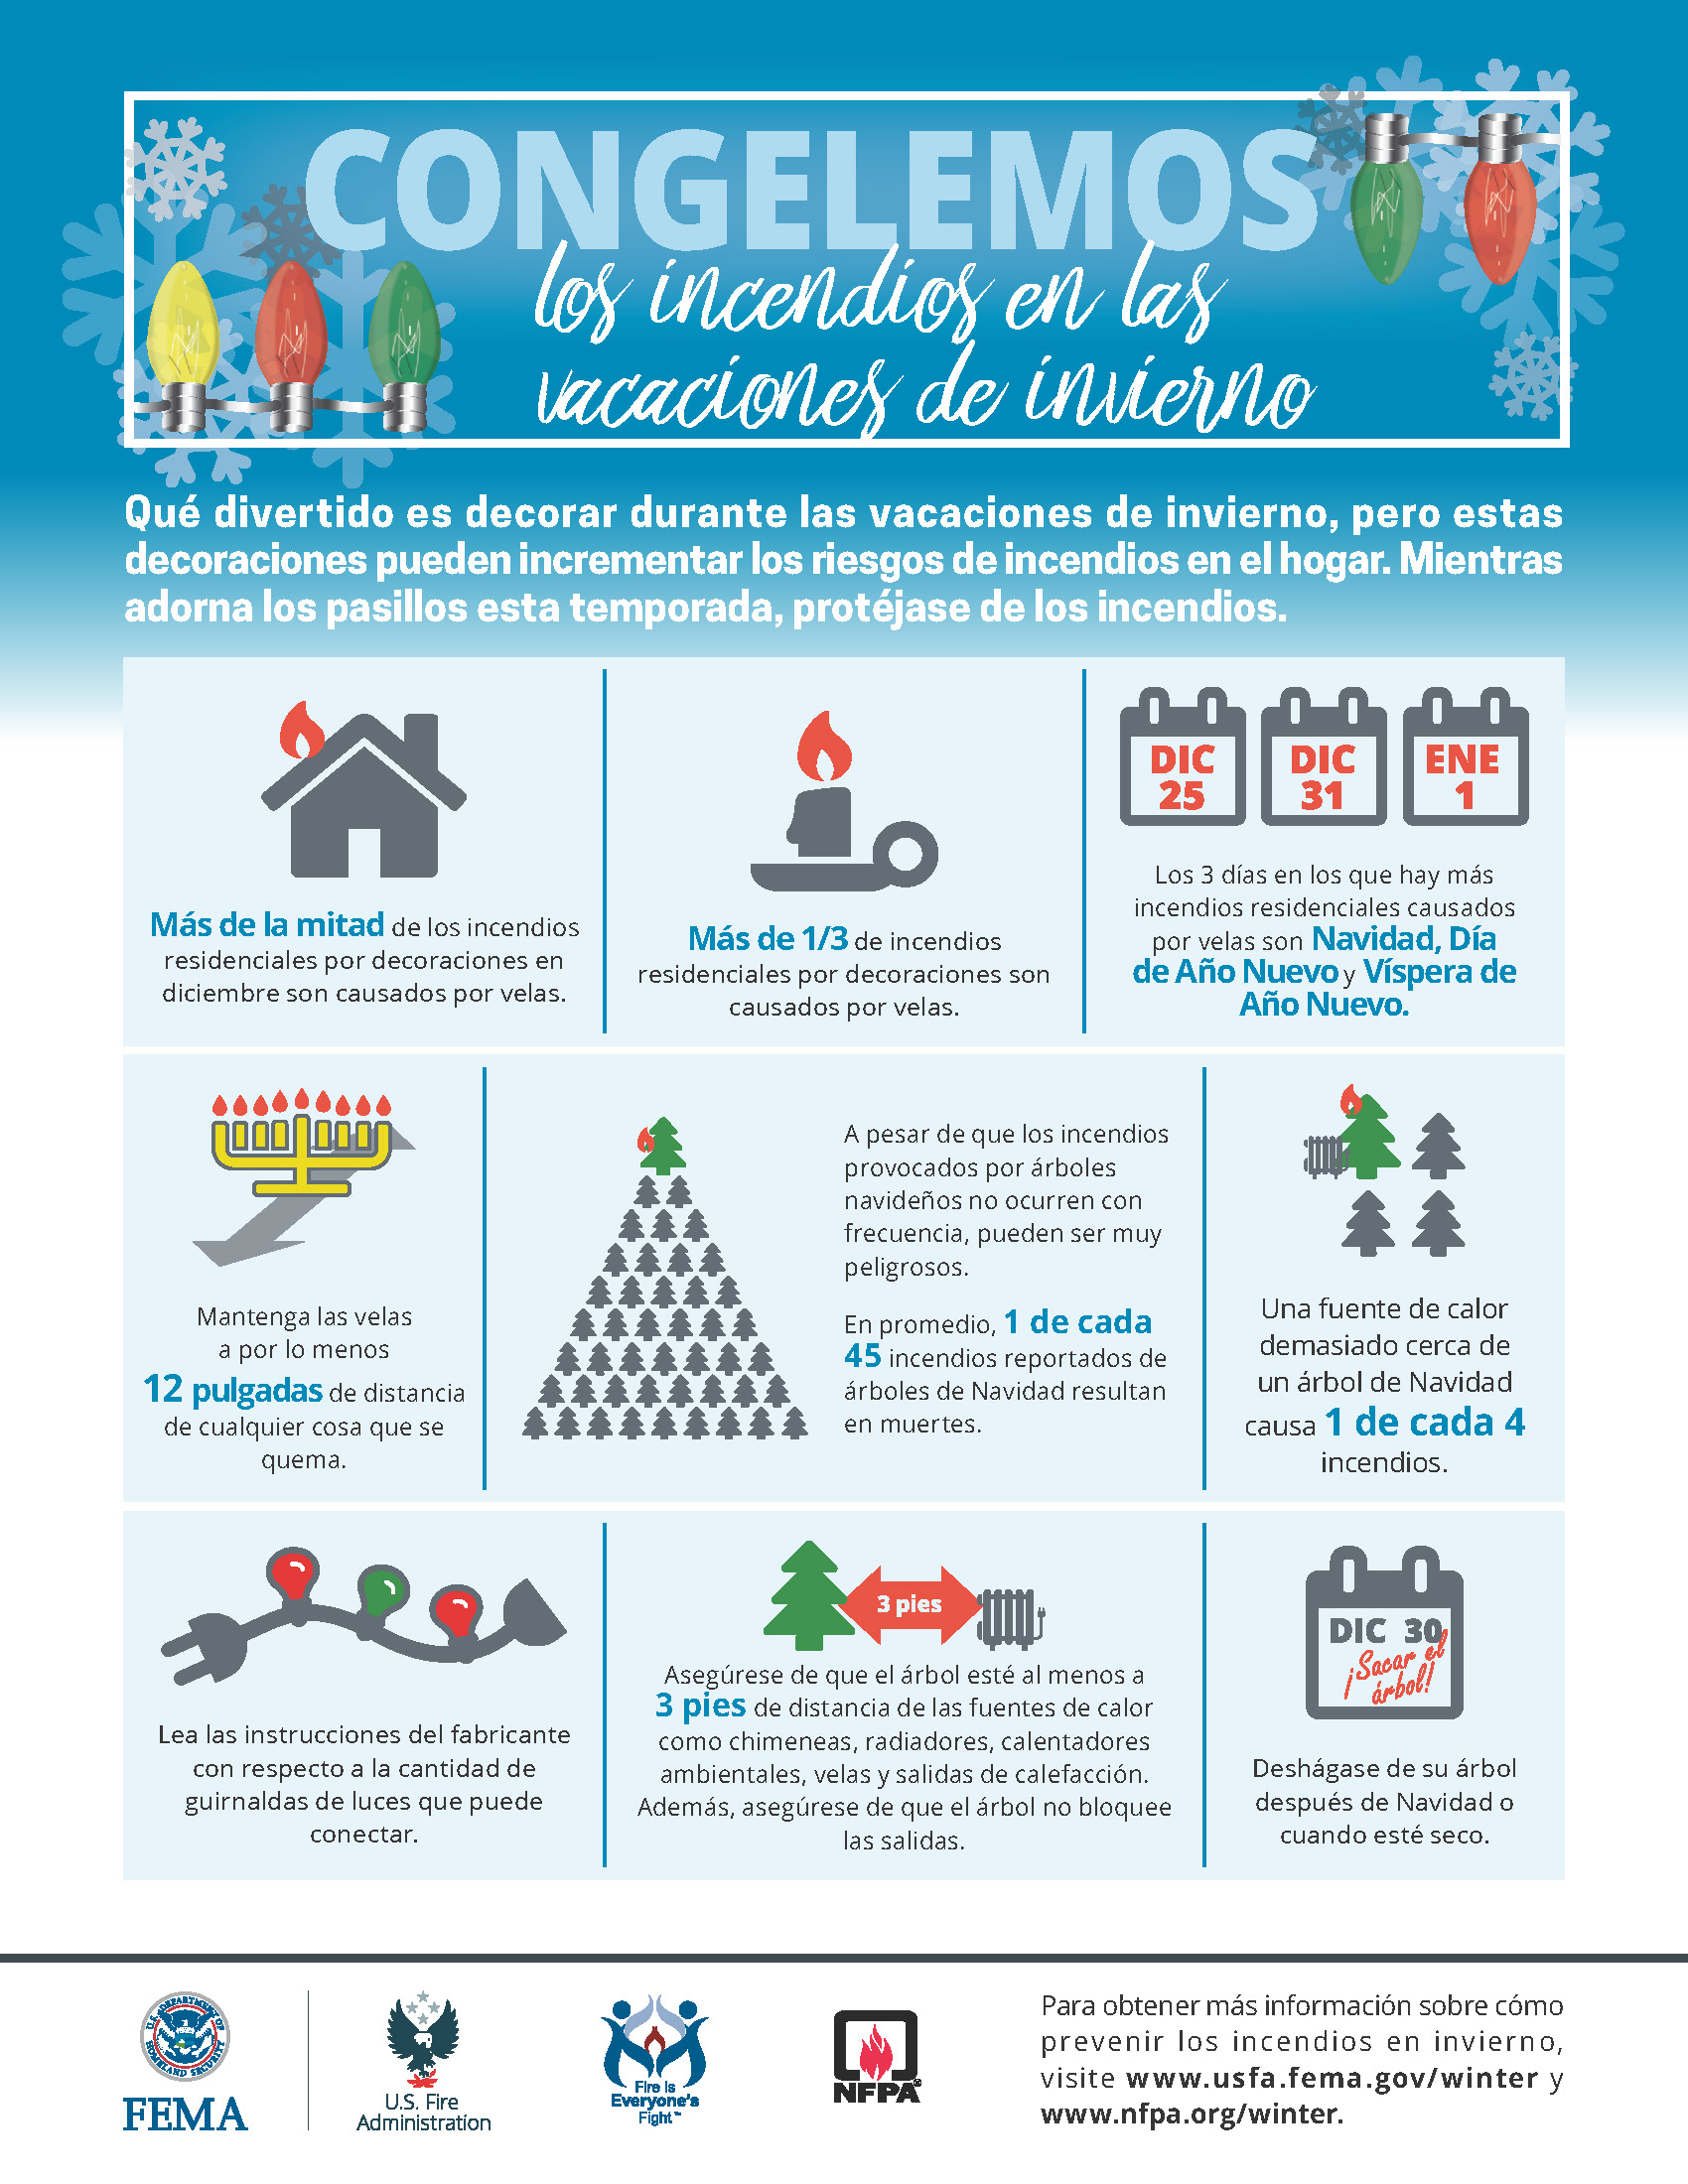 NFPA - Winter holidays